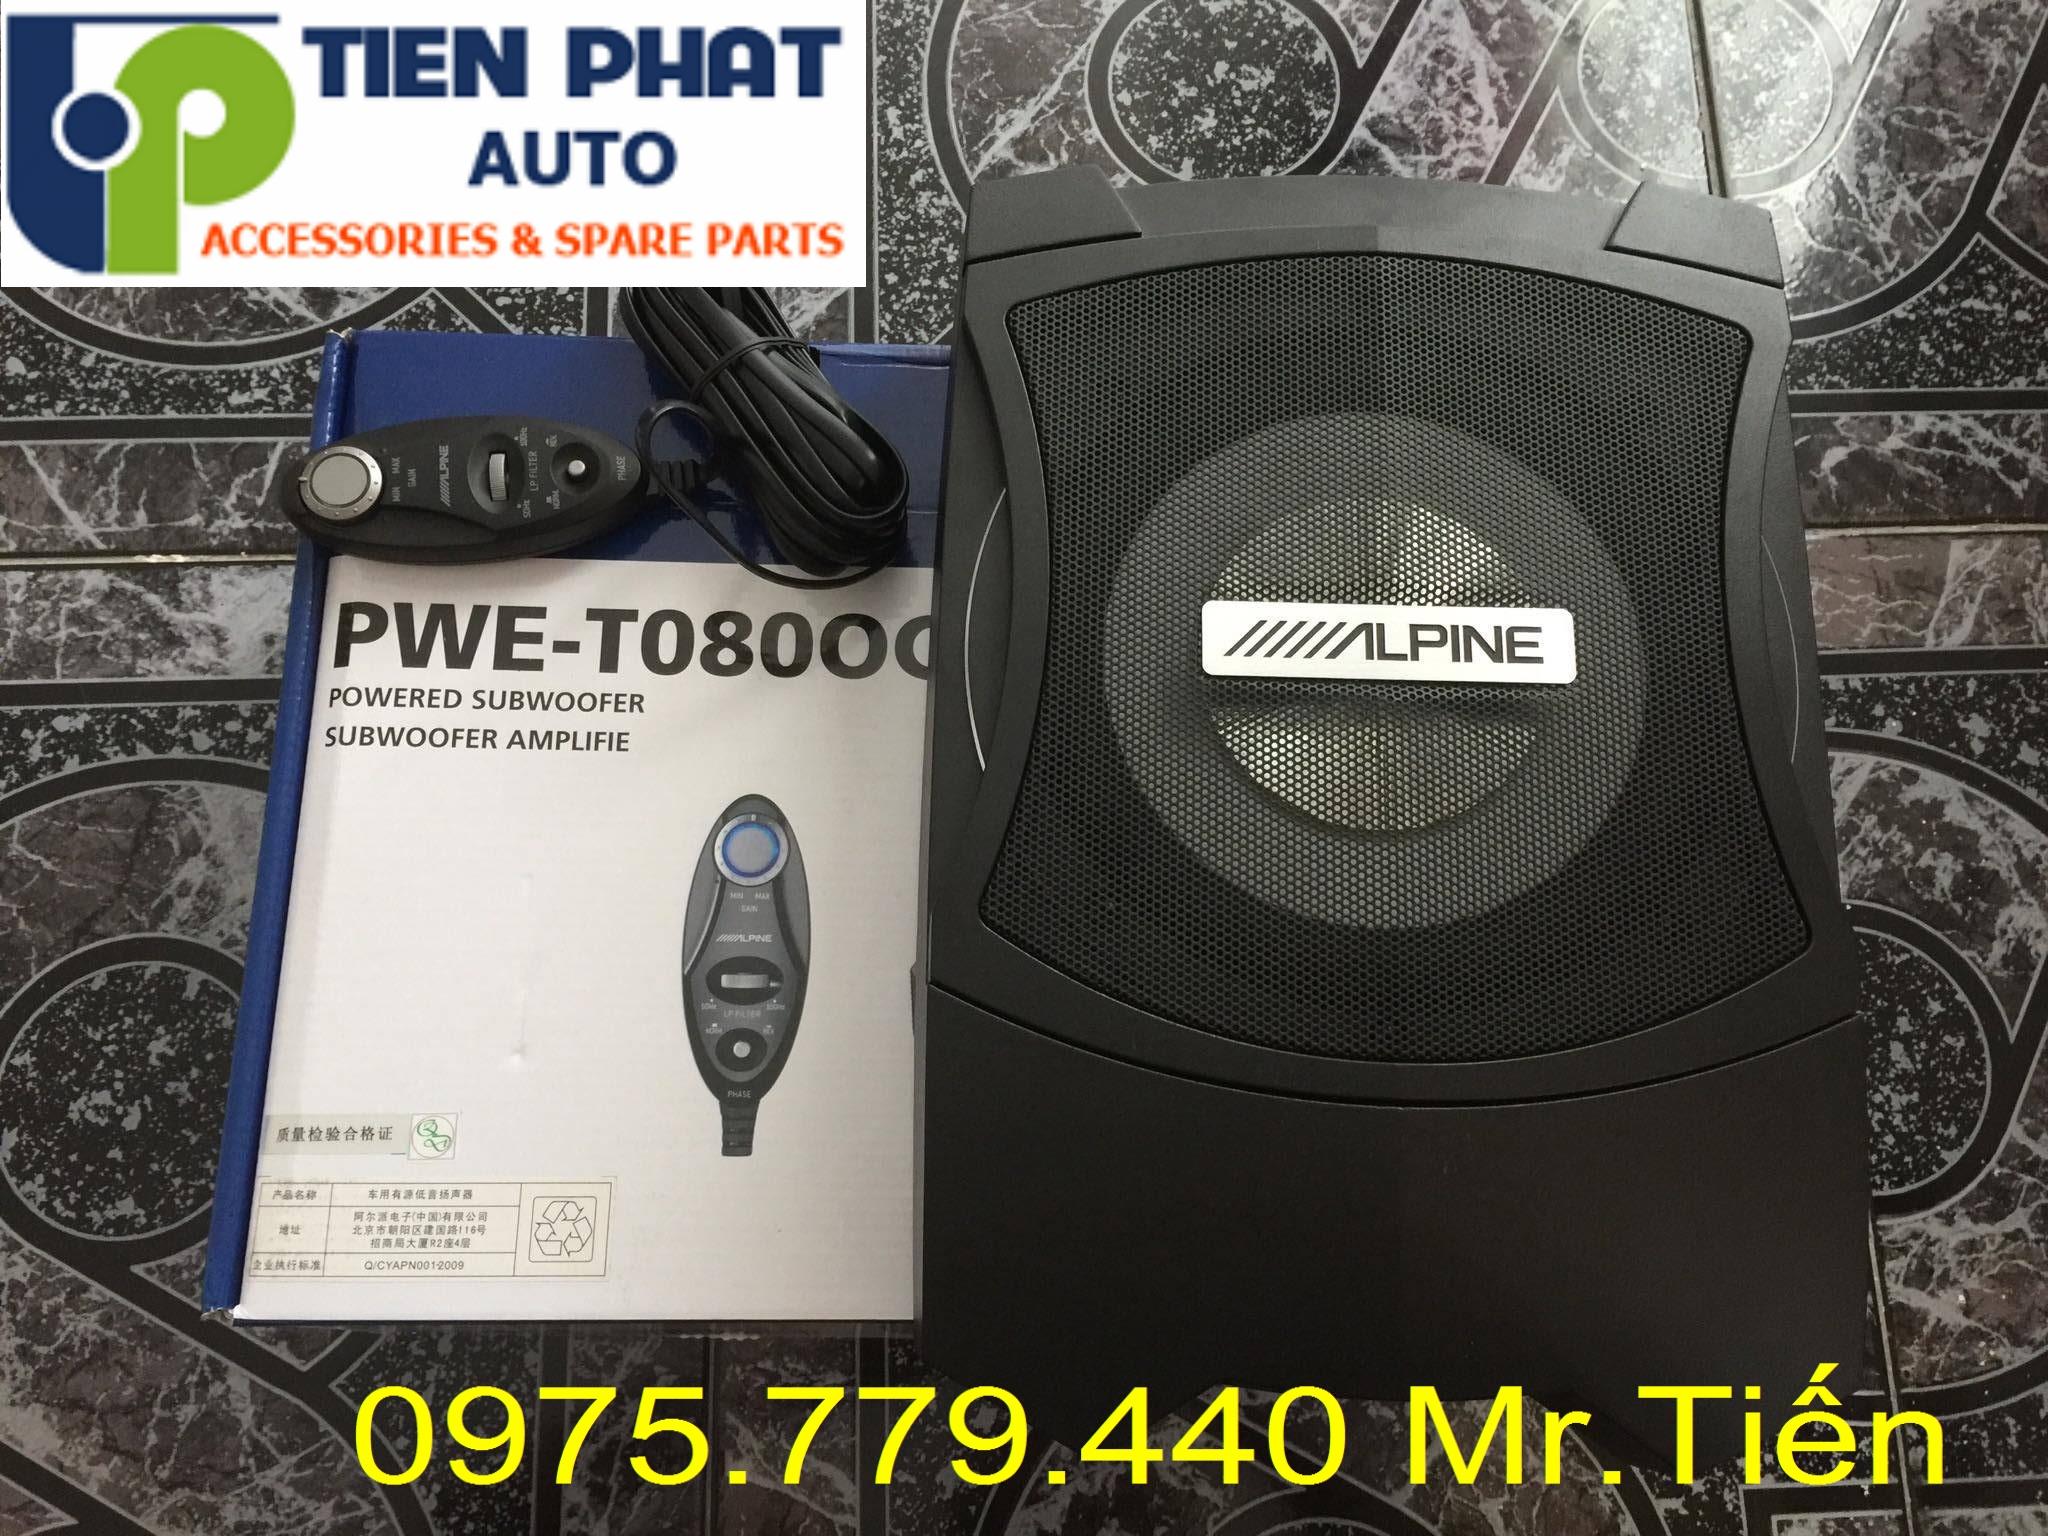 Lắp Loa sub Alpine PWE-T0800C cho Mazda 2 Lắp Đặt Tận Nơi